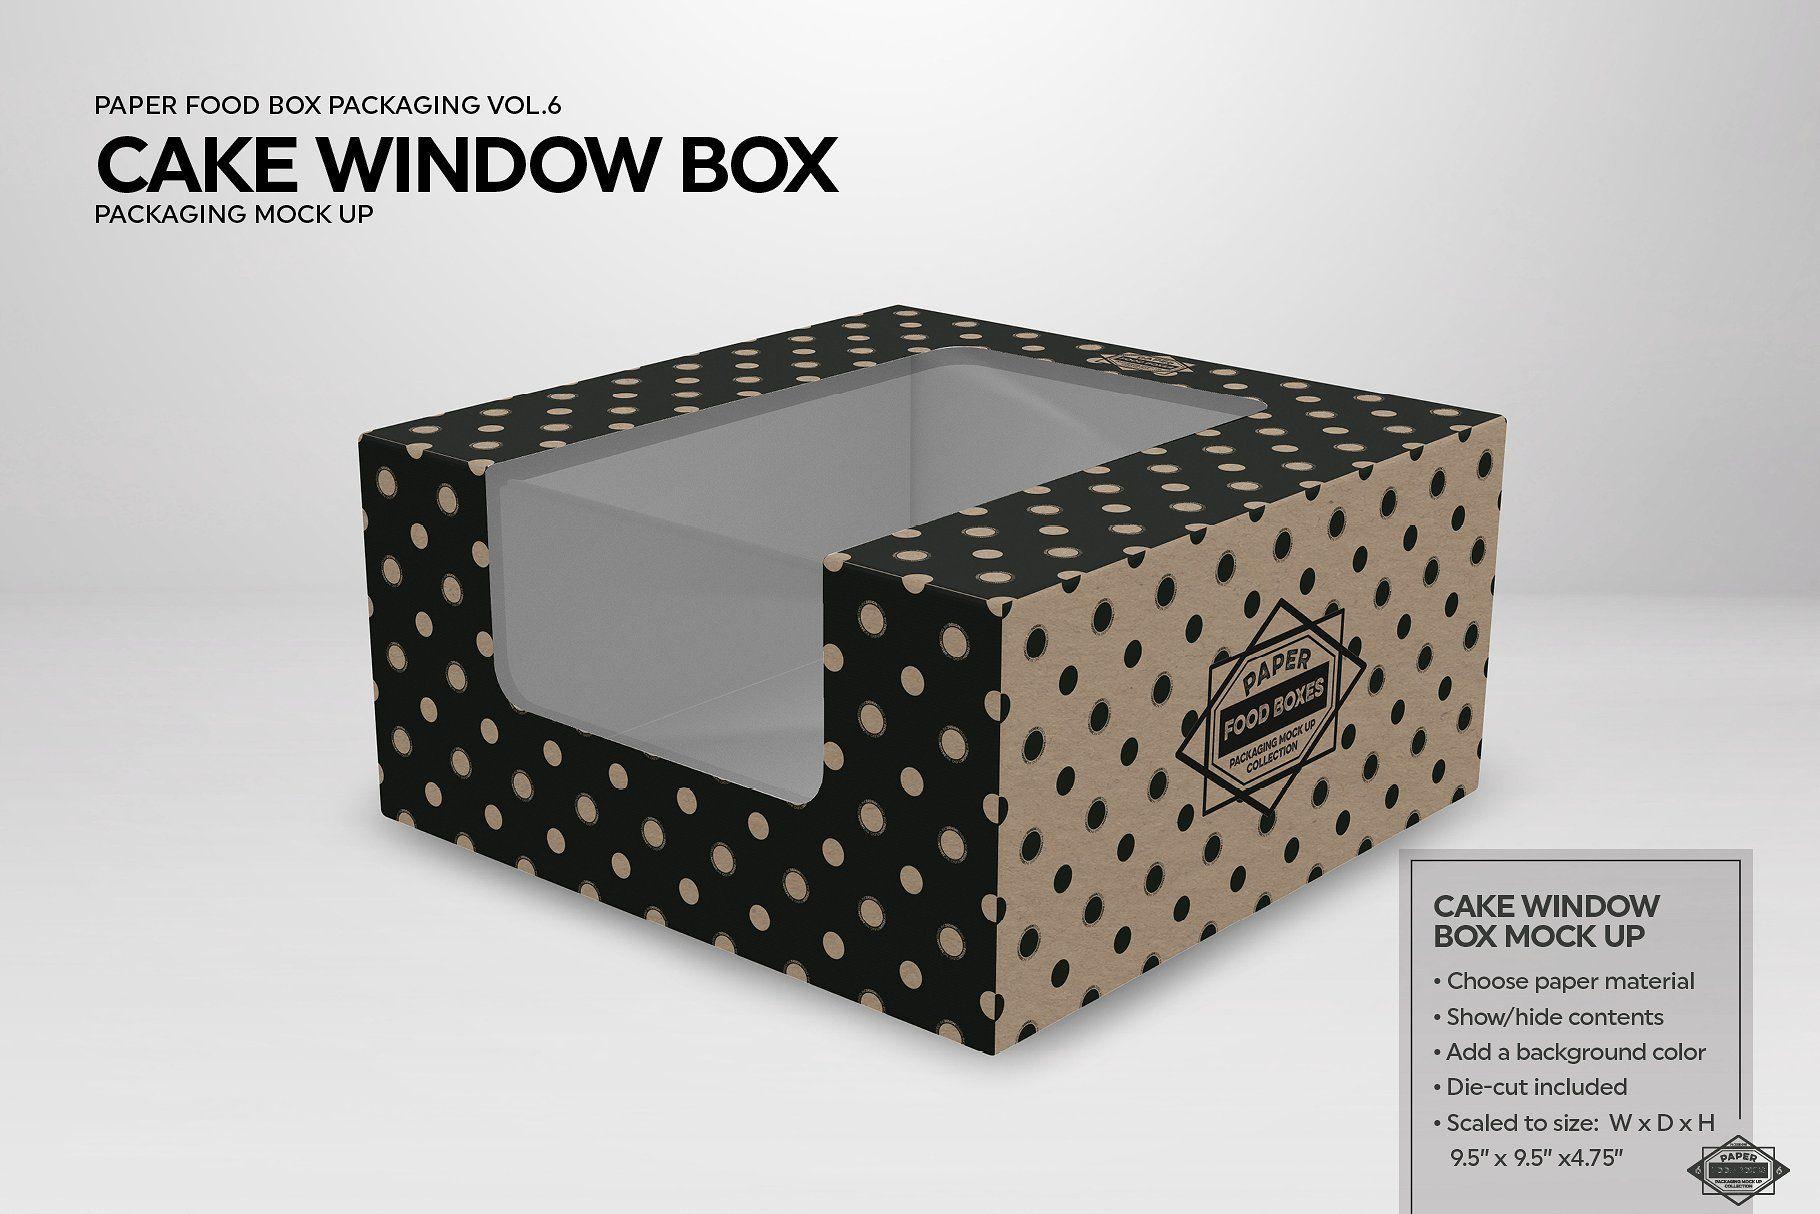 Download Cake Window Box Packaging Mockup Packaging Mockup Packaging Food Box Packaging